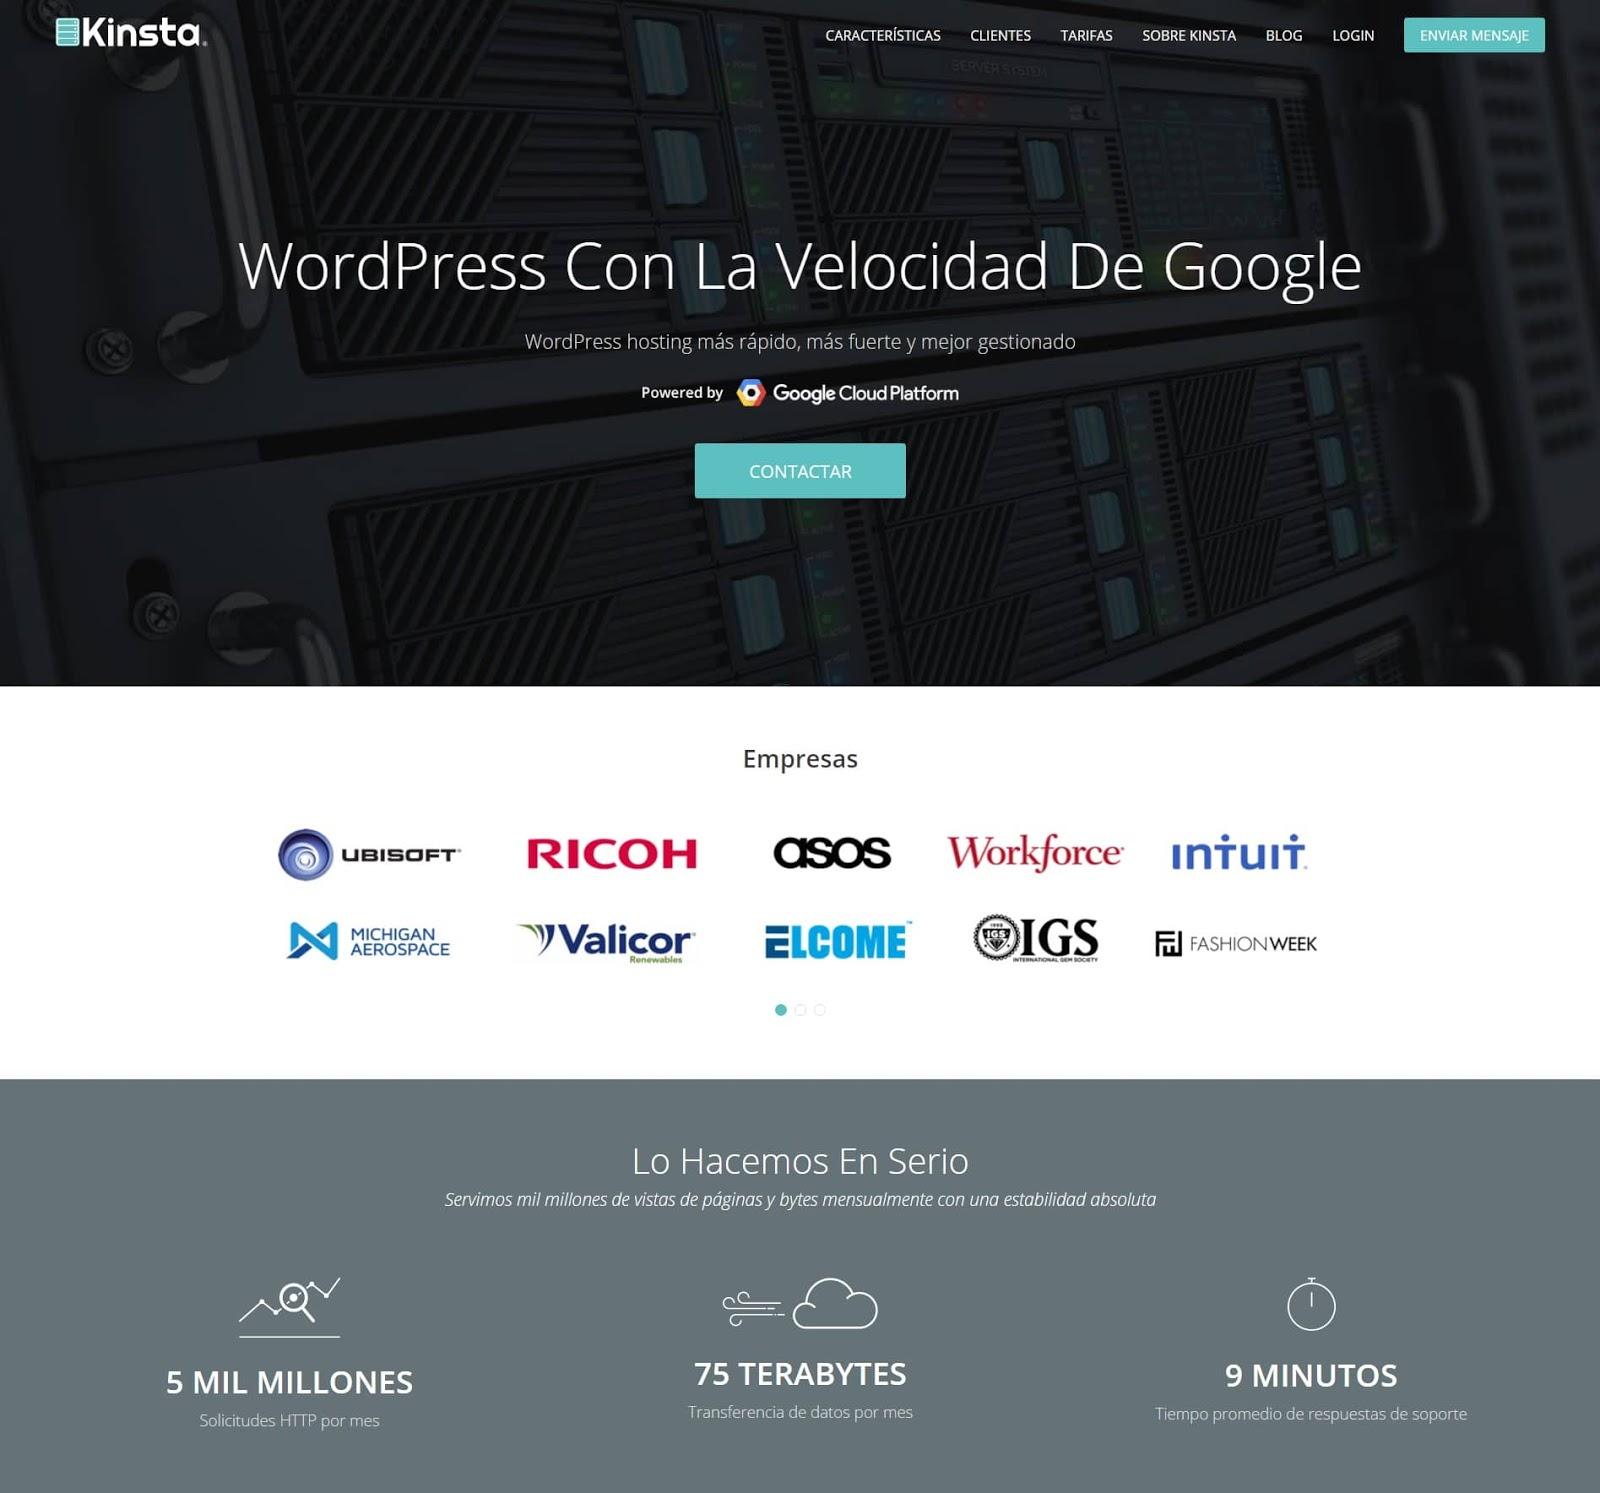 Kinsta's Spanish Hosting Launch